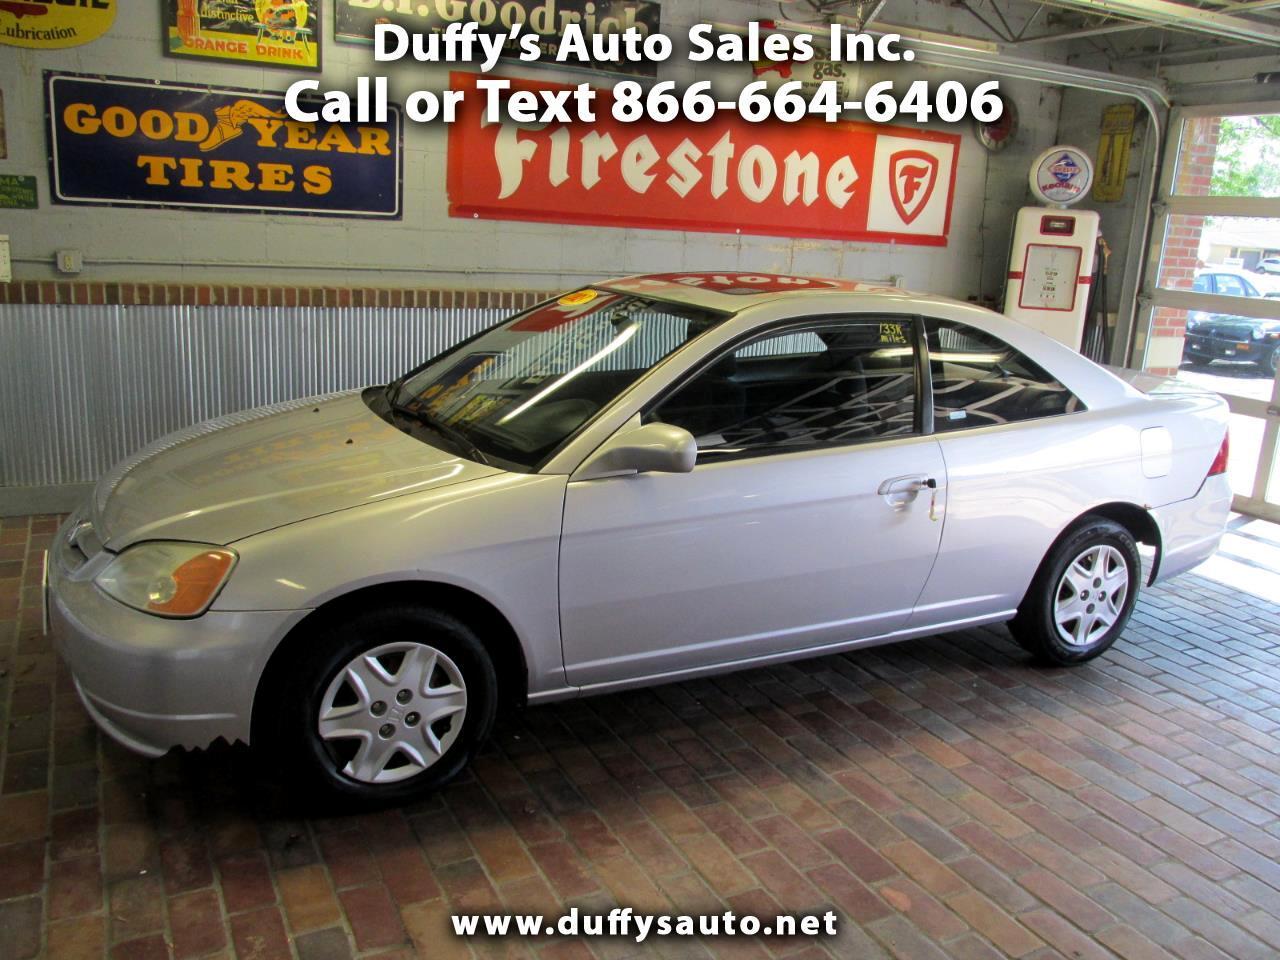 2003 Honda Civic 2dr Cpe EX Auto w/Side Airbags